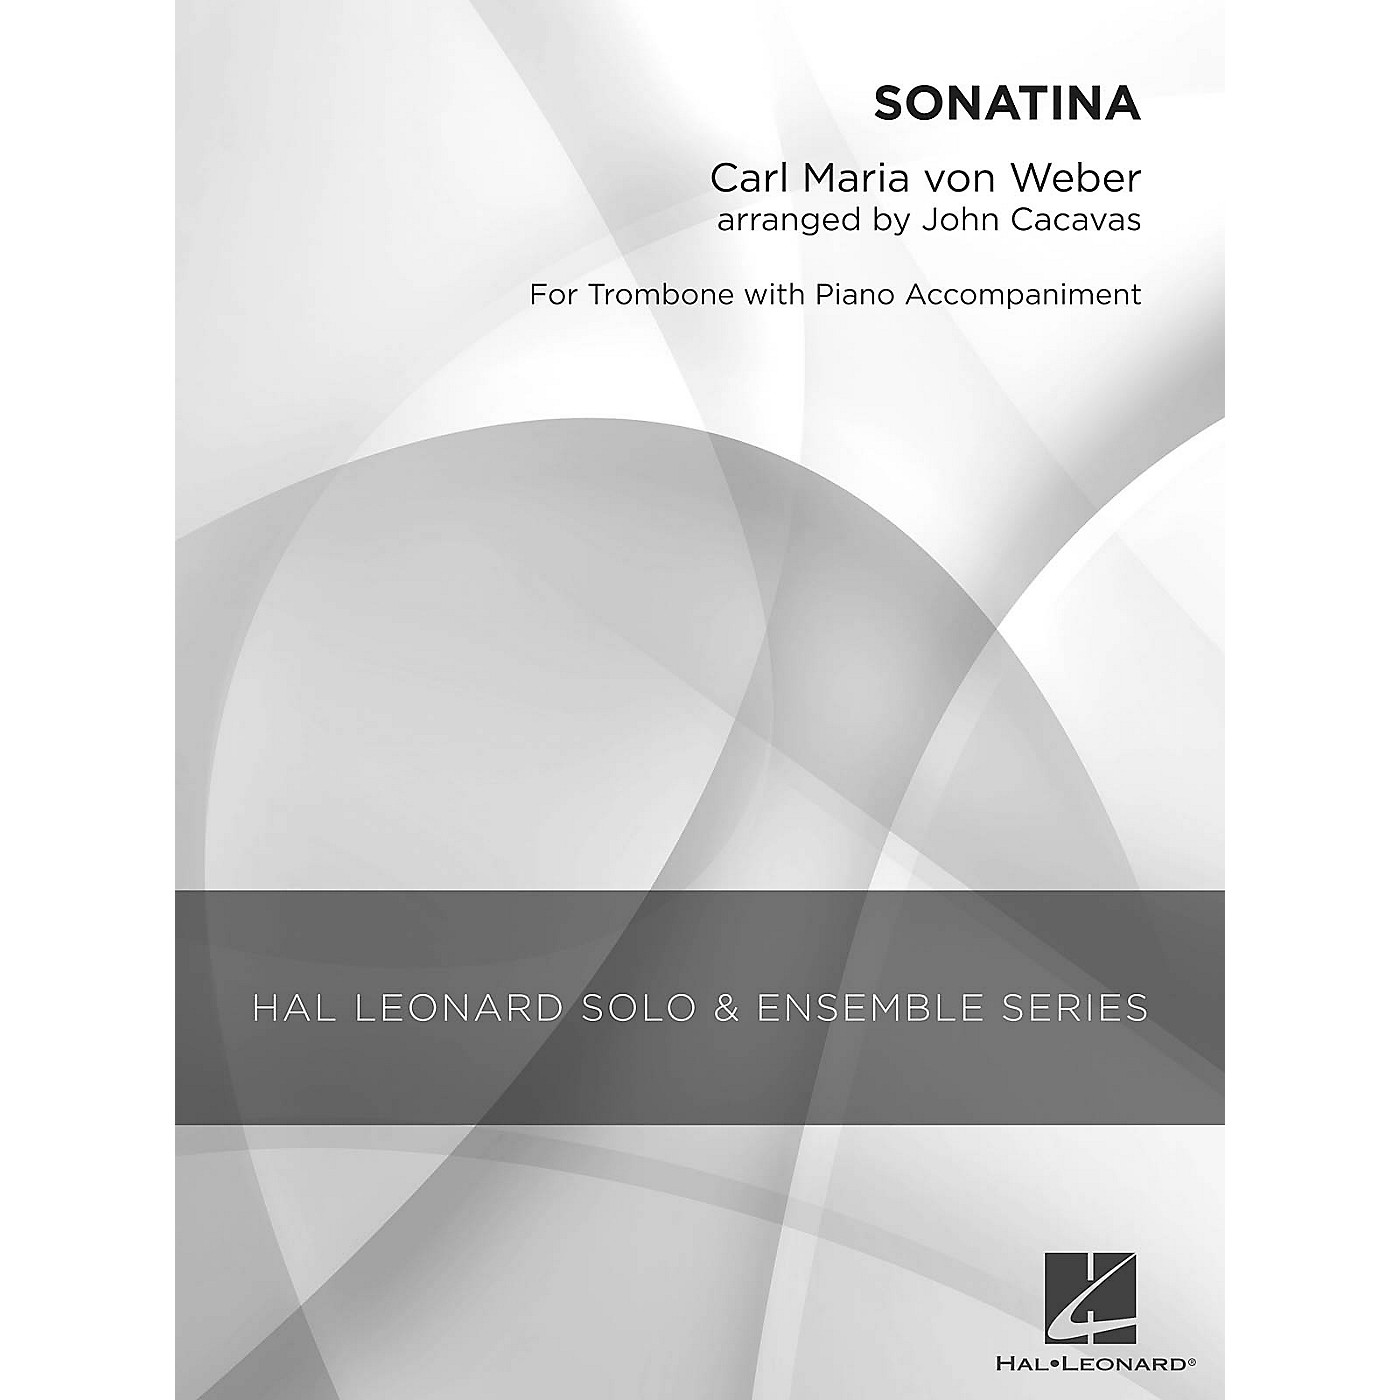 Hal Leonard Sonatina (Grade 3 Trombone Solo) Concert Band Level 3 Arranged by John Cacavas thumbnail